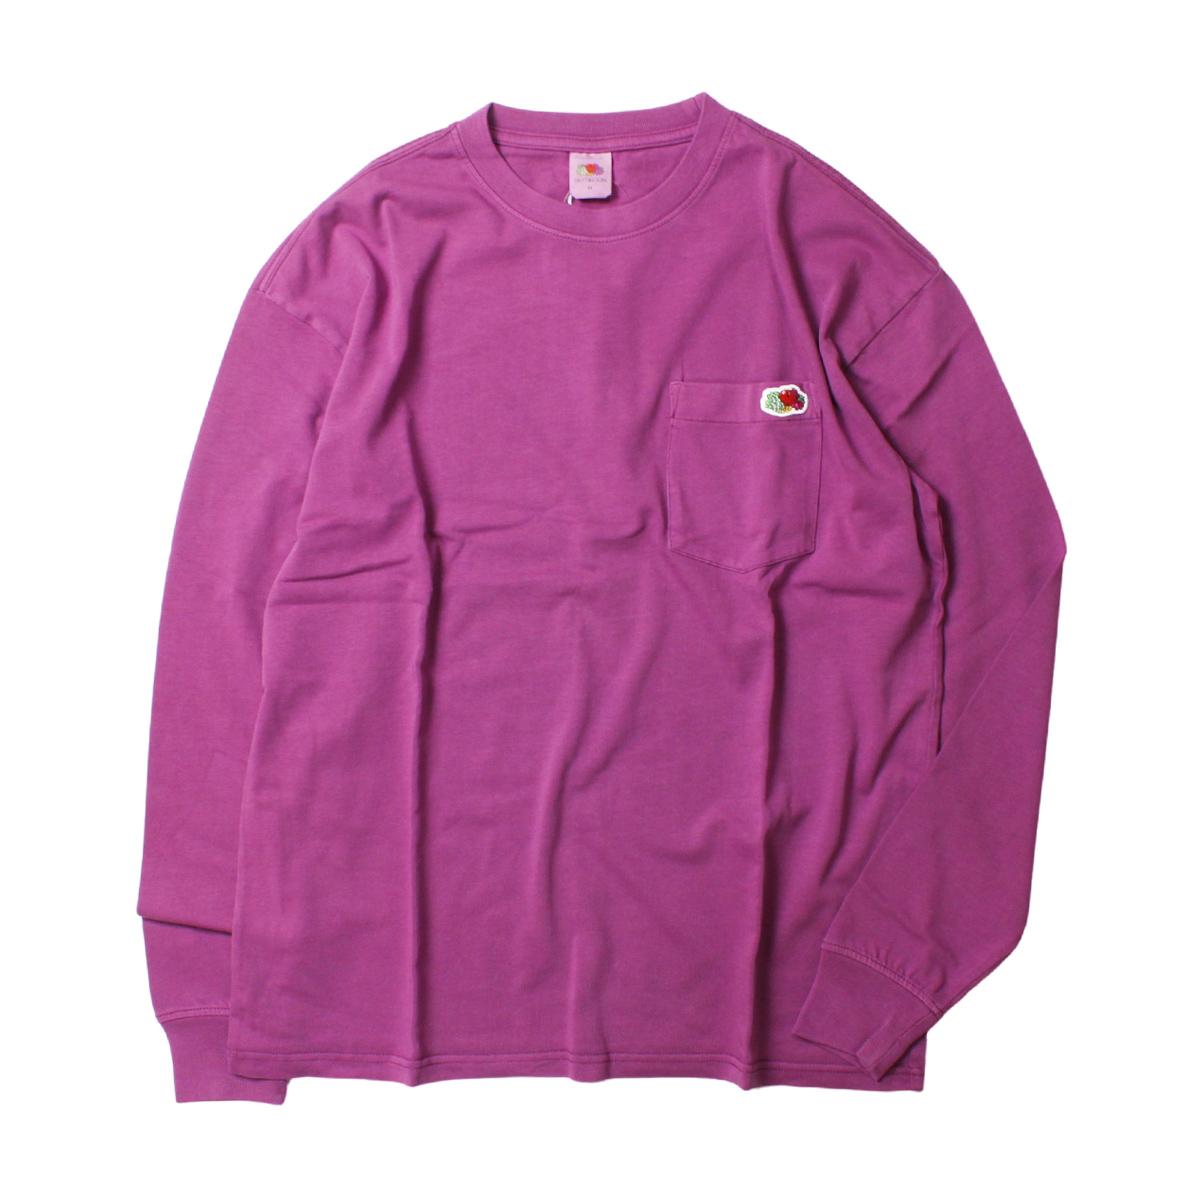 Fruit of the Loom フルーツオブザルーム FTL 米綿 製品染め ポケット付き L/S Tシャツ